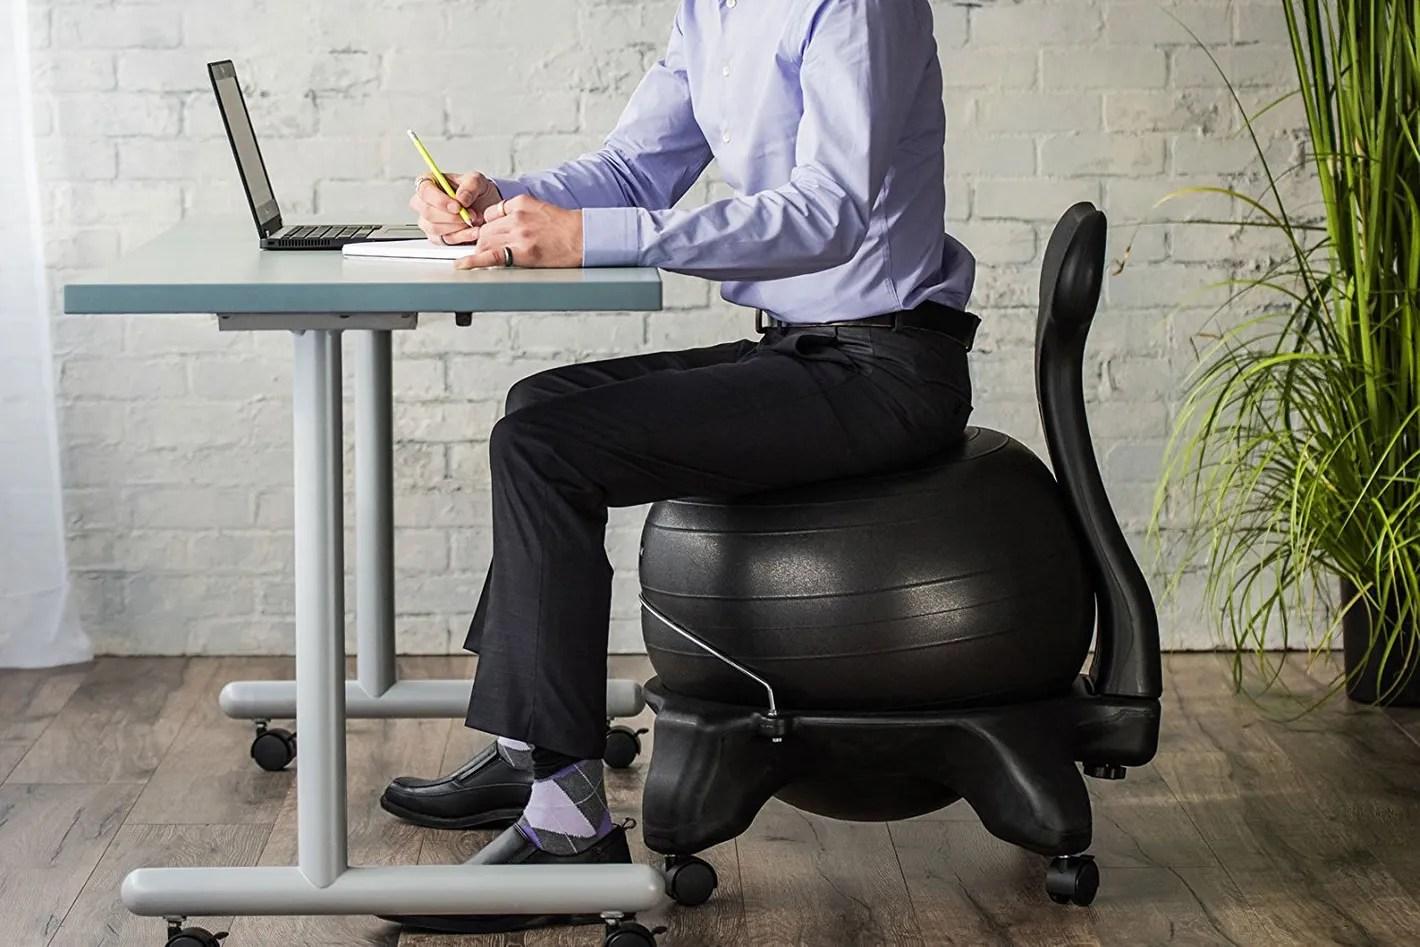 Best Laptop Stands Ergonomic Desk Setups from Chiropractors